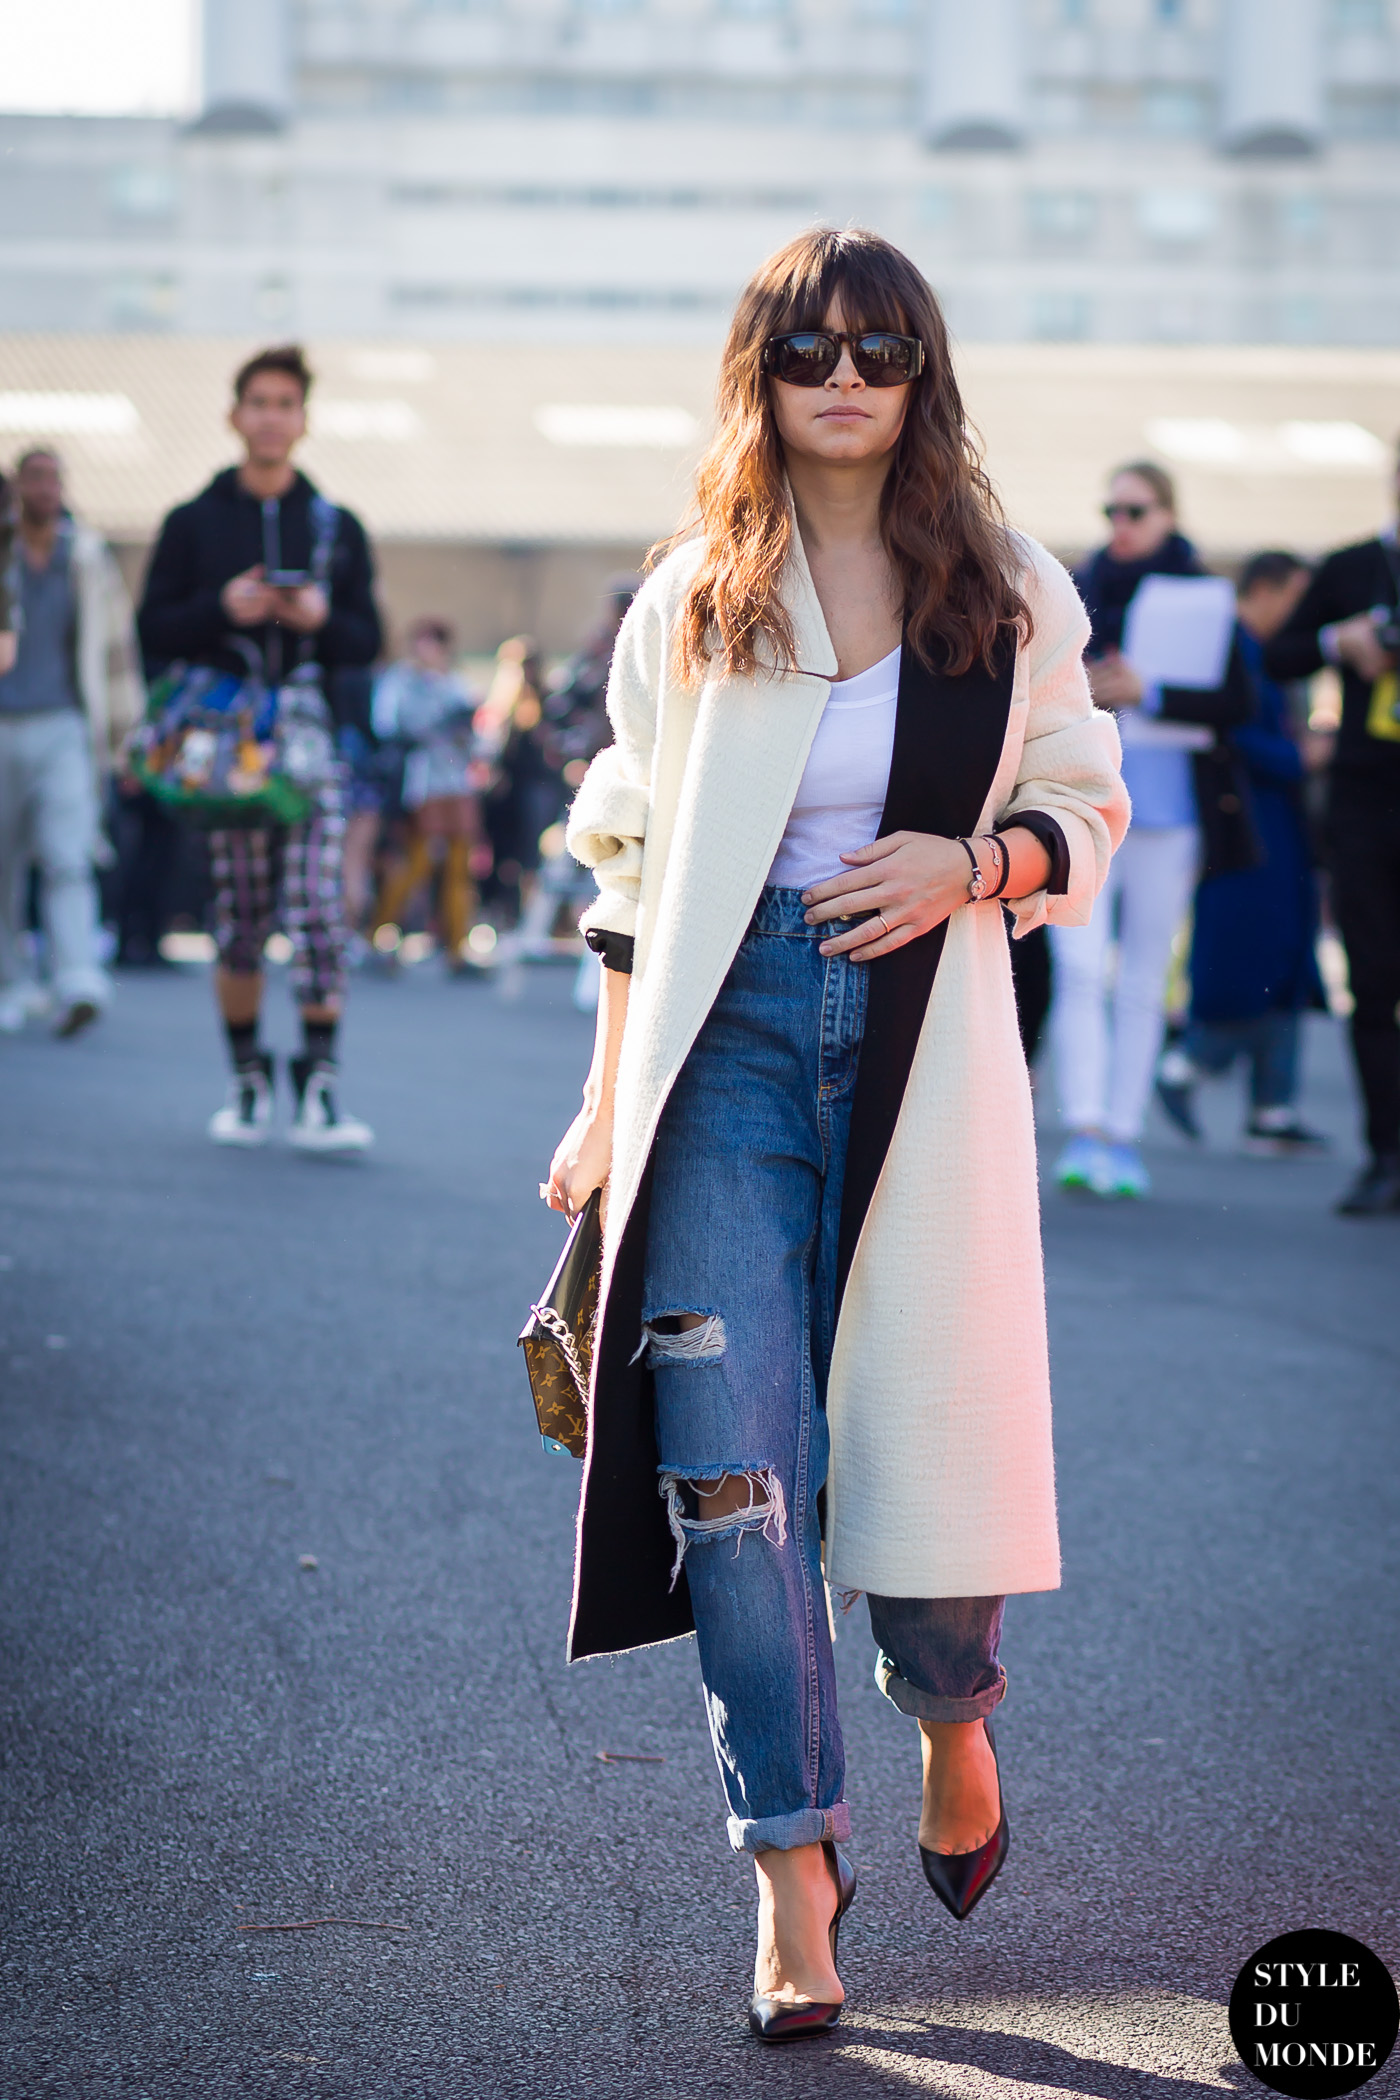 Paris Fashion Week Fw 2015 Street Style Miroslava Duma Style Du Monde Street Style Street